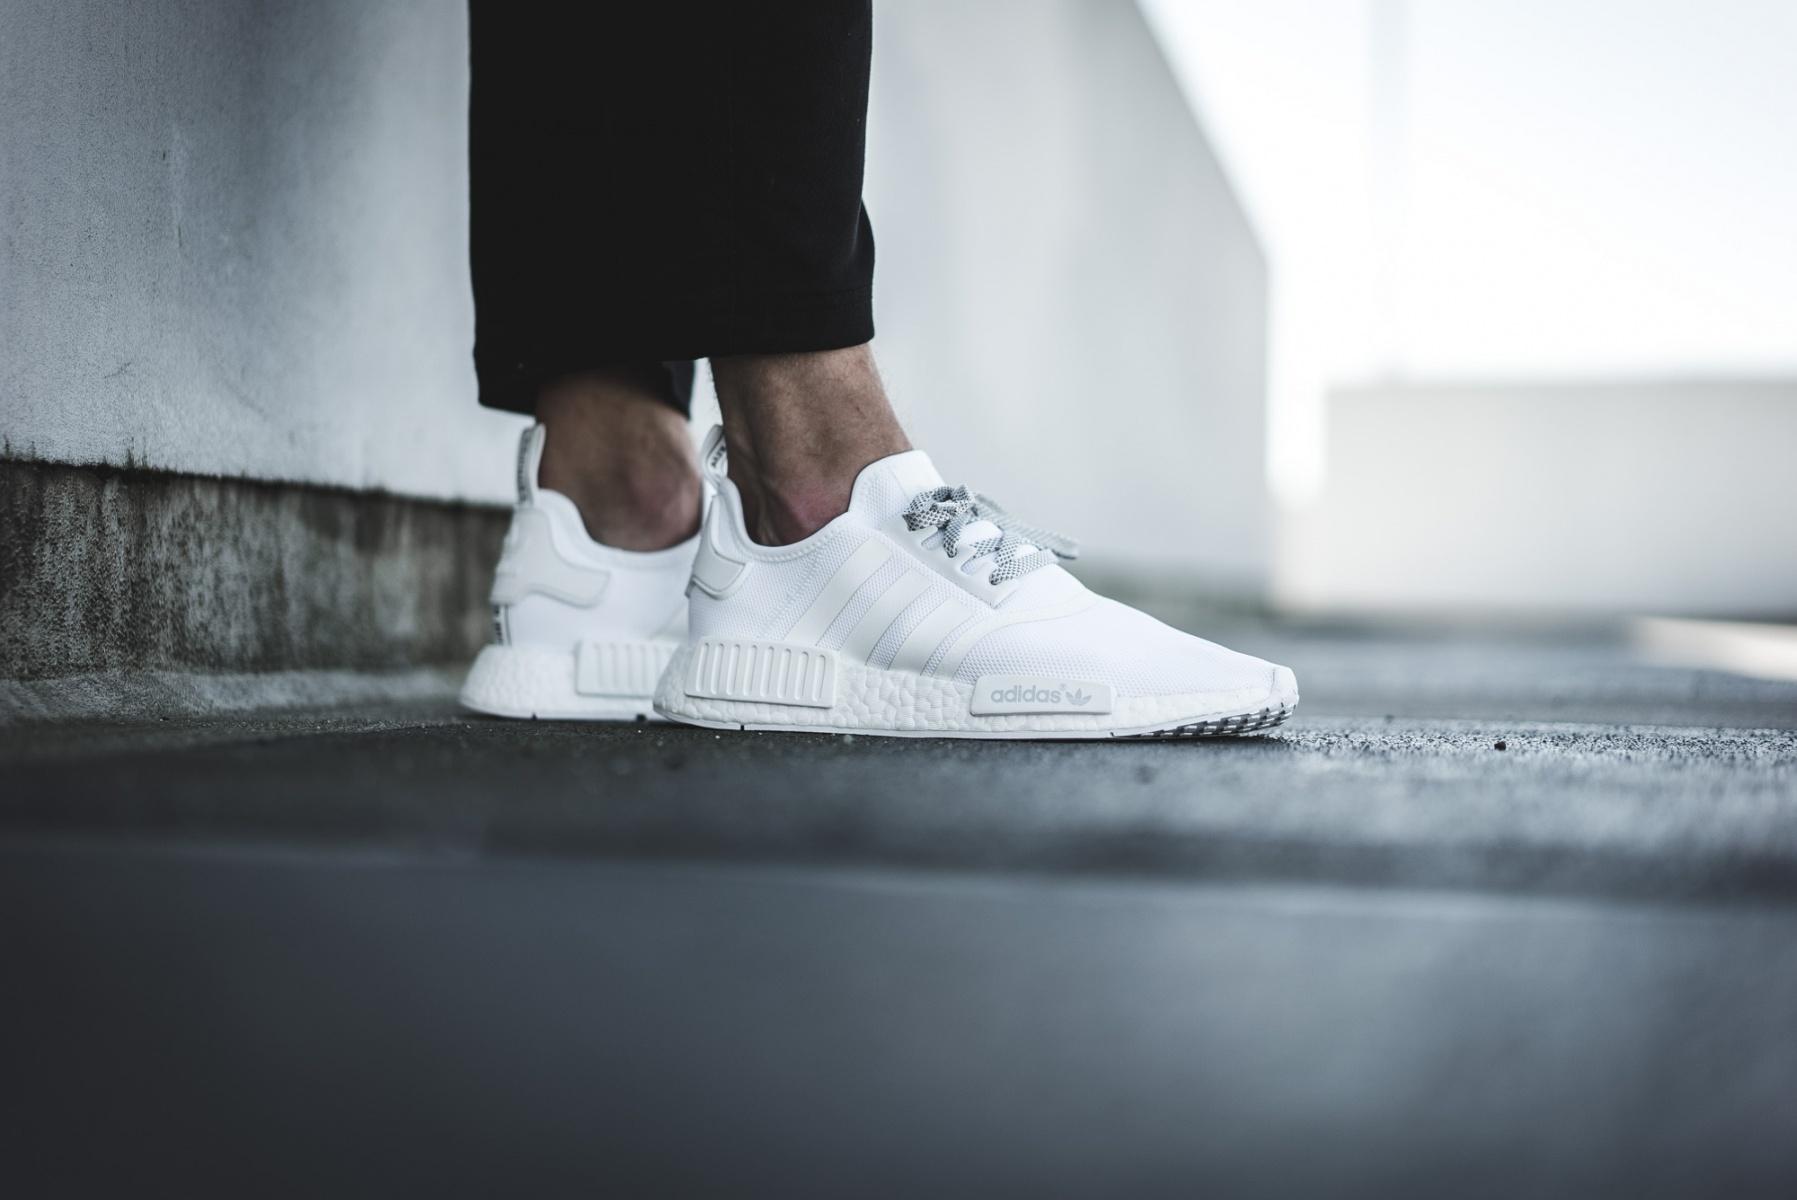 Restock Adidas Nmd R1 Triple White Sneaker Shouts